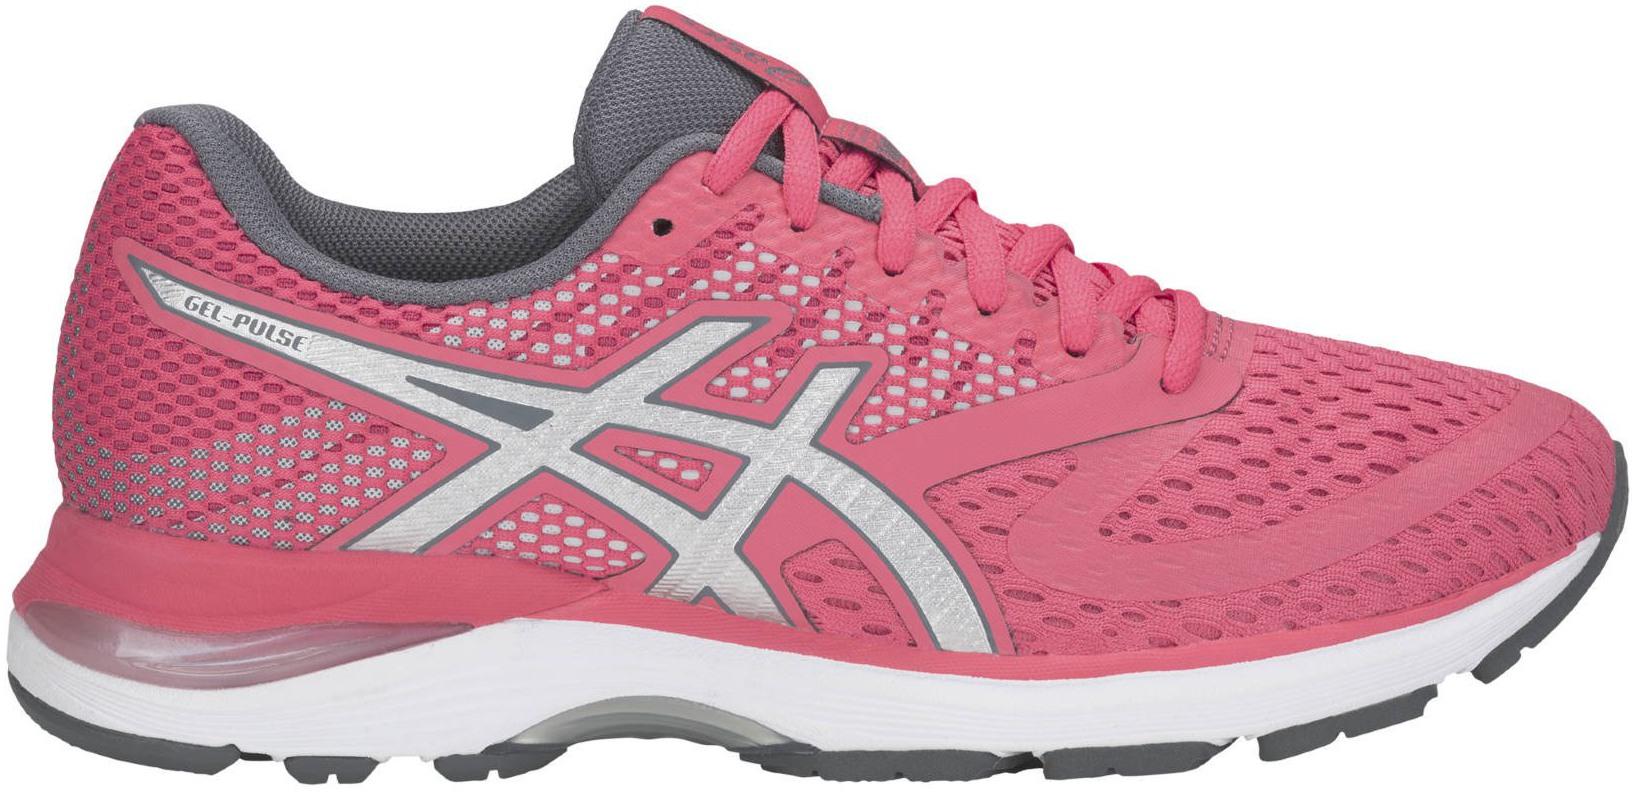 Women's running shoes Asics GEL-PULSE